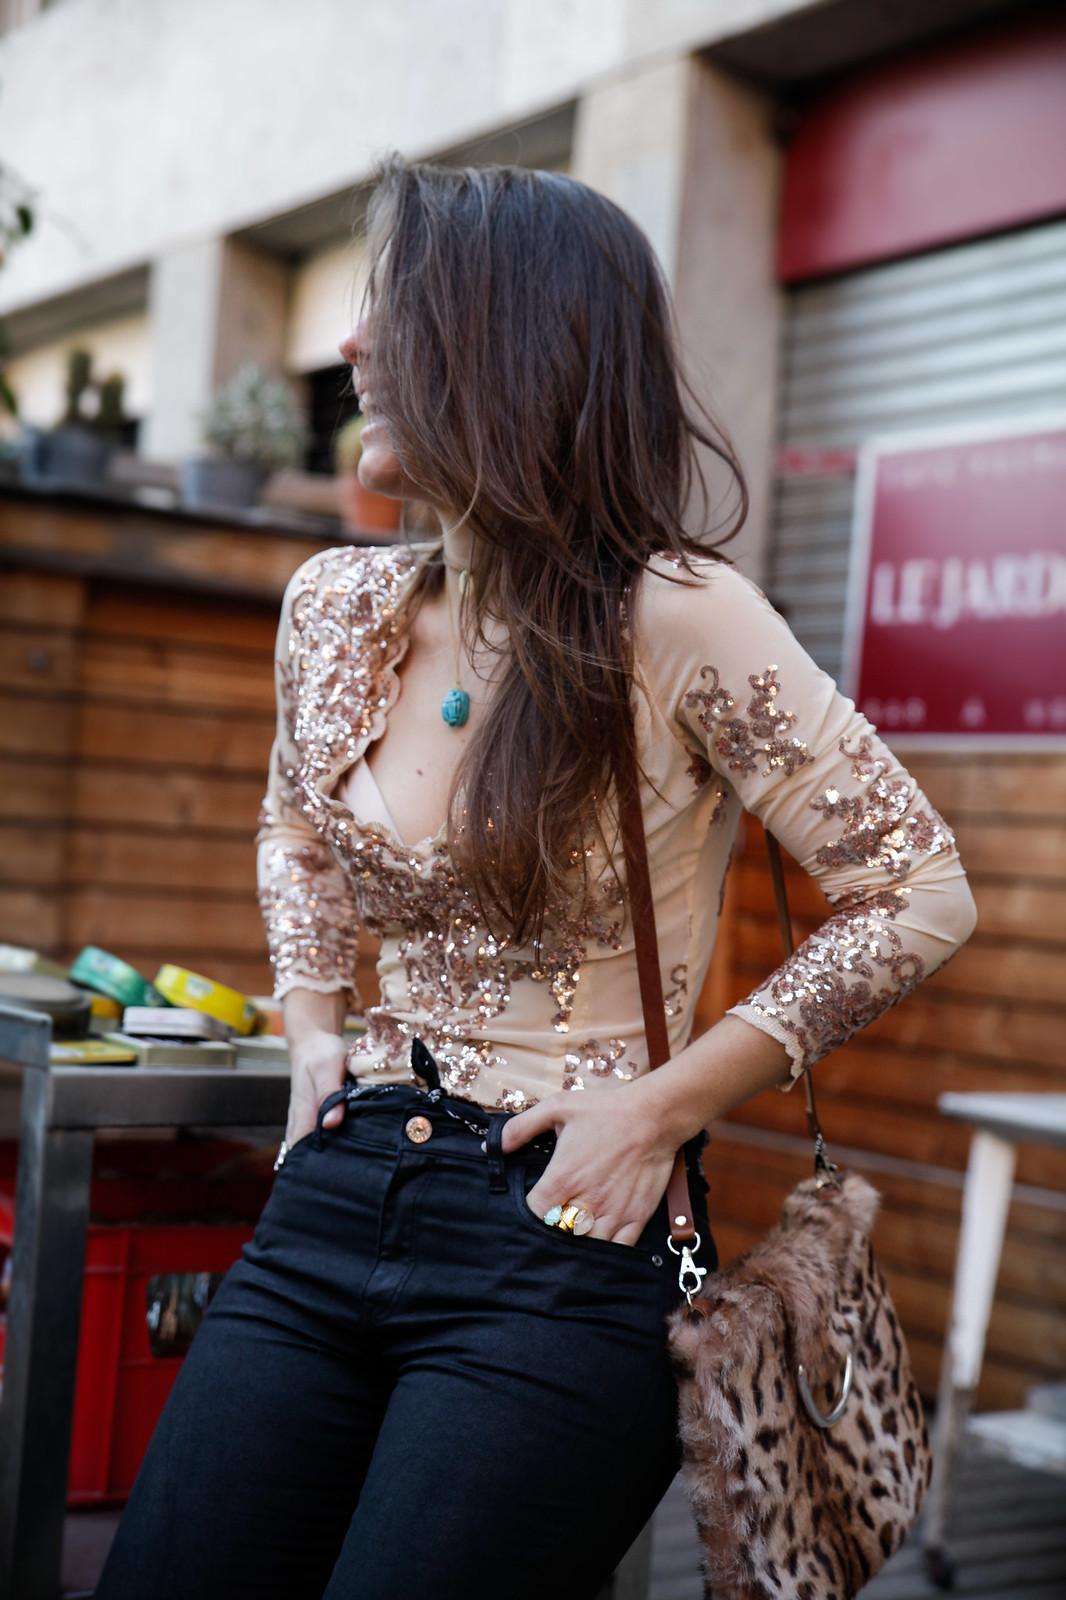 02_Sequins_Body_Nihgt_outfit_Danity_Paris_theguestgirl_laura_santolaria